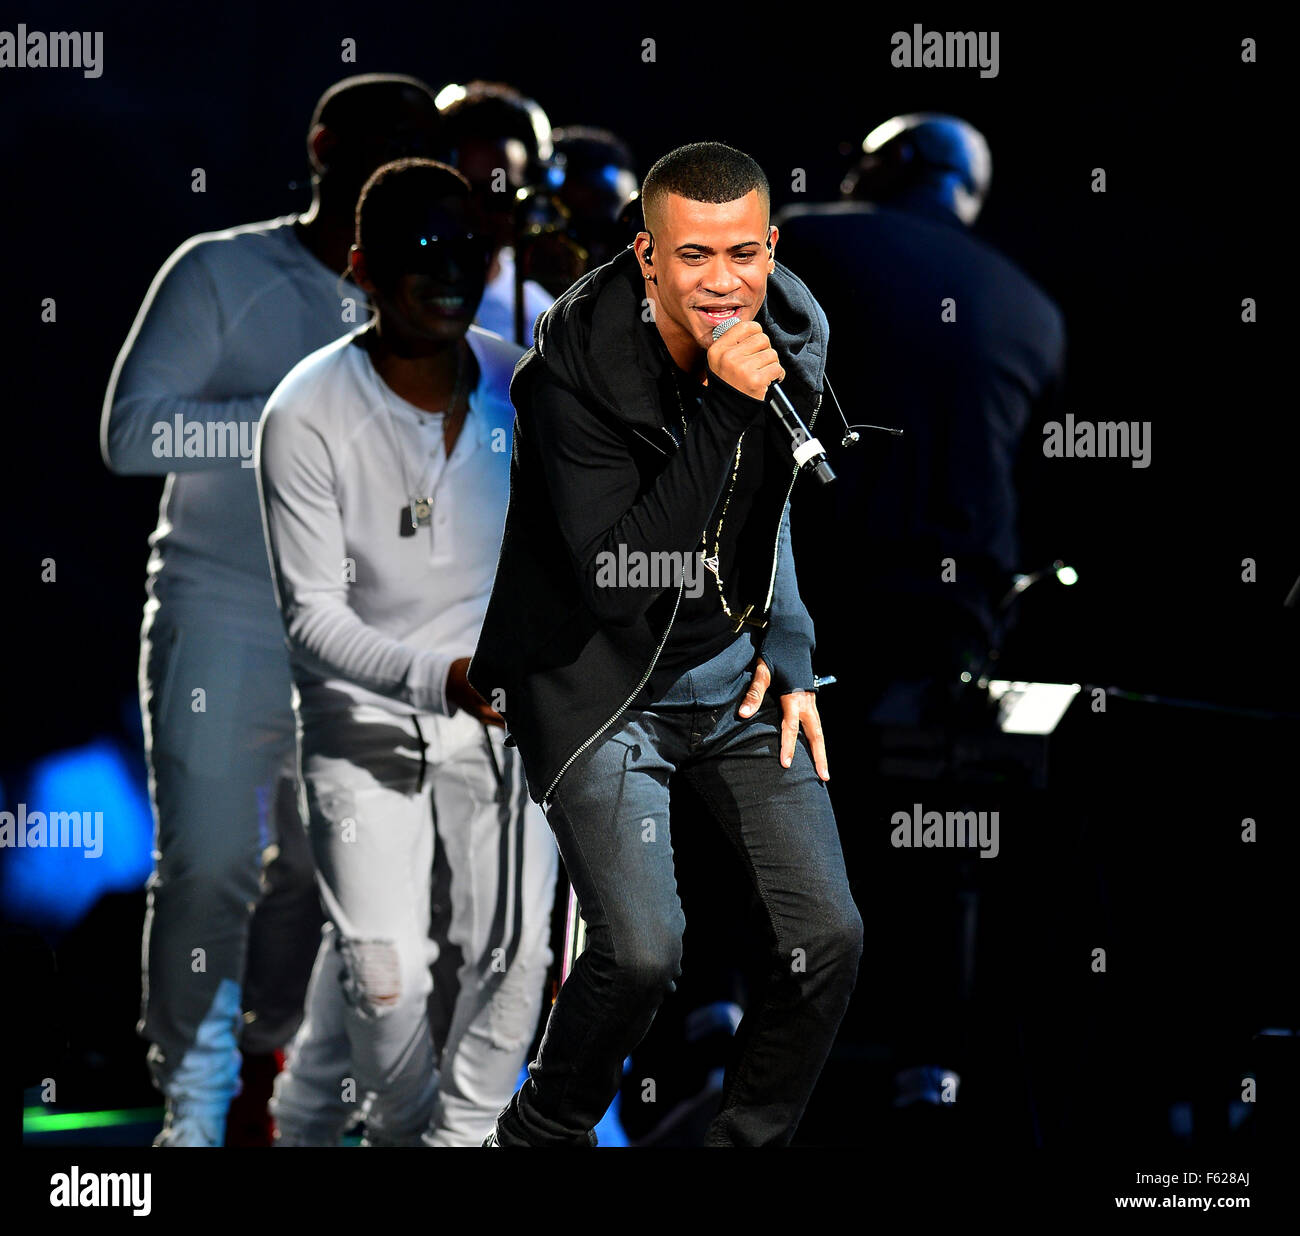 Gente de Zona perform at the American Airlines Arena  Featuring: Randy Malcom Martinez, Gente de Zona Where: Miami, Stock Photo